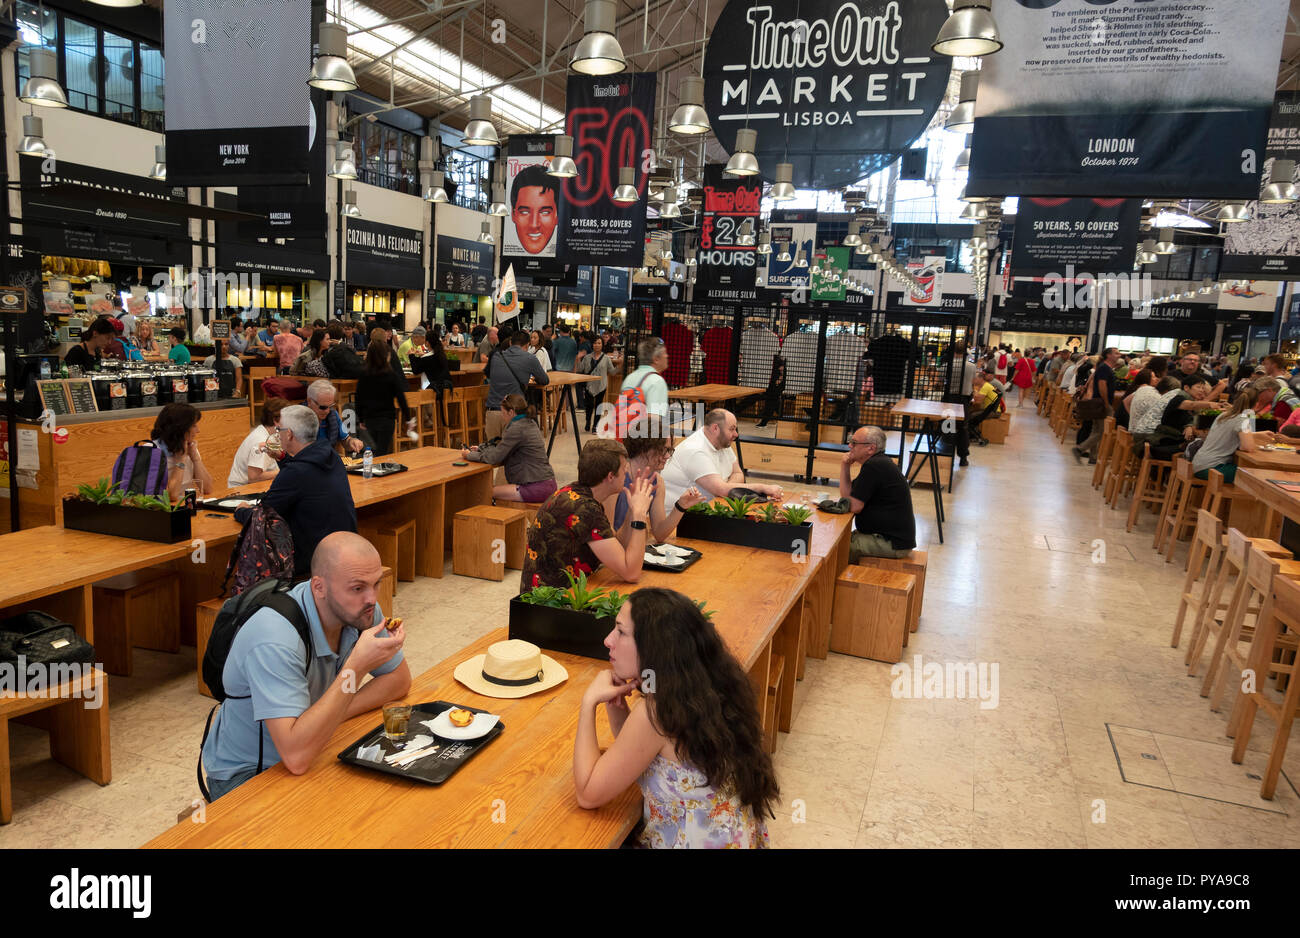 Time Out Market Lisboa db800ec225b2b